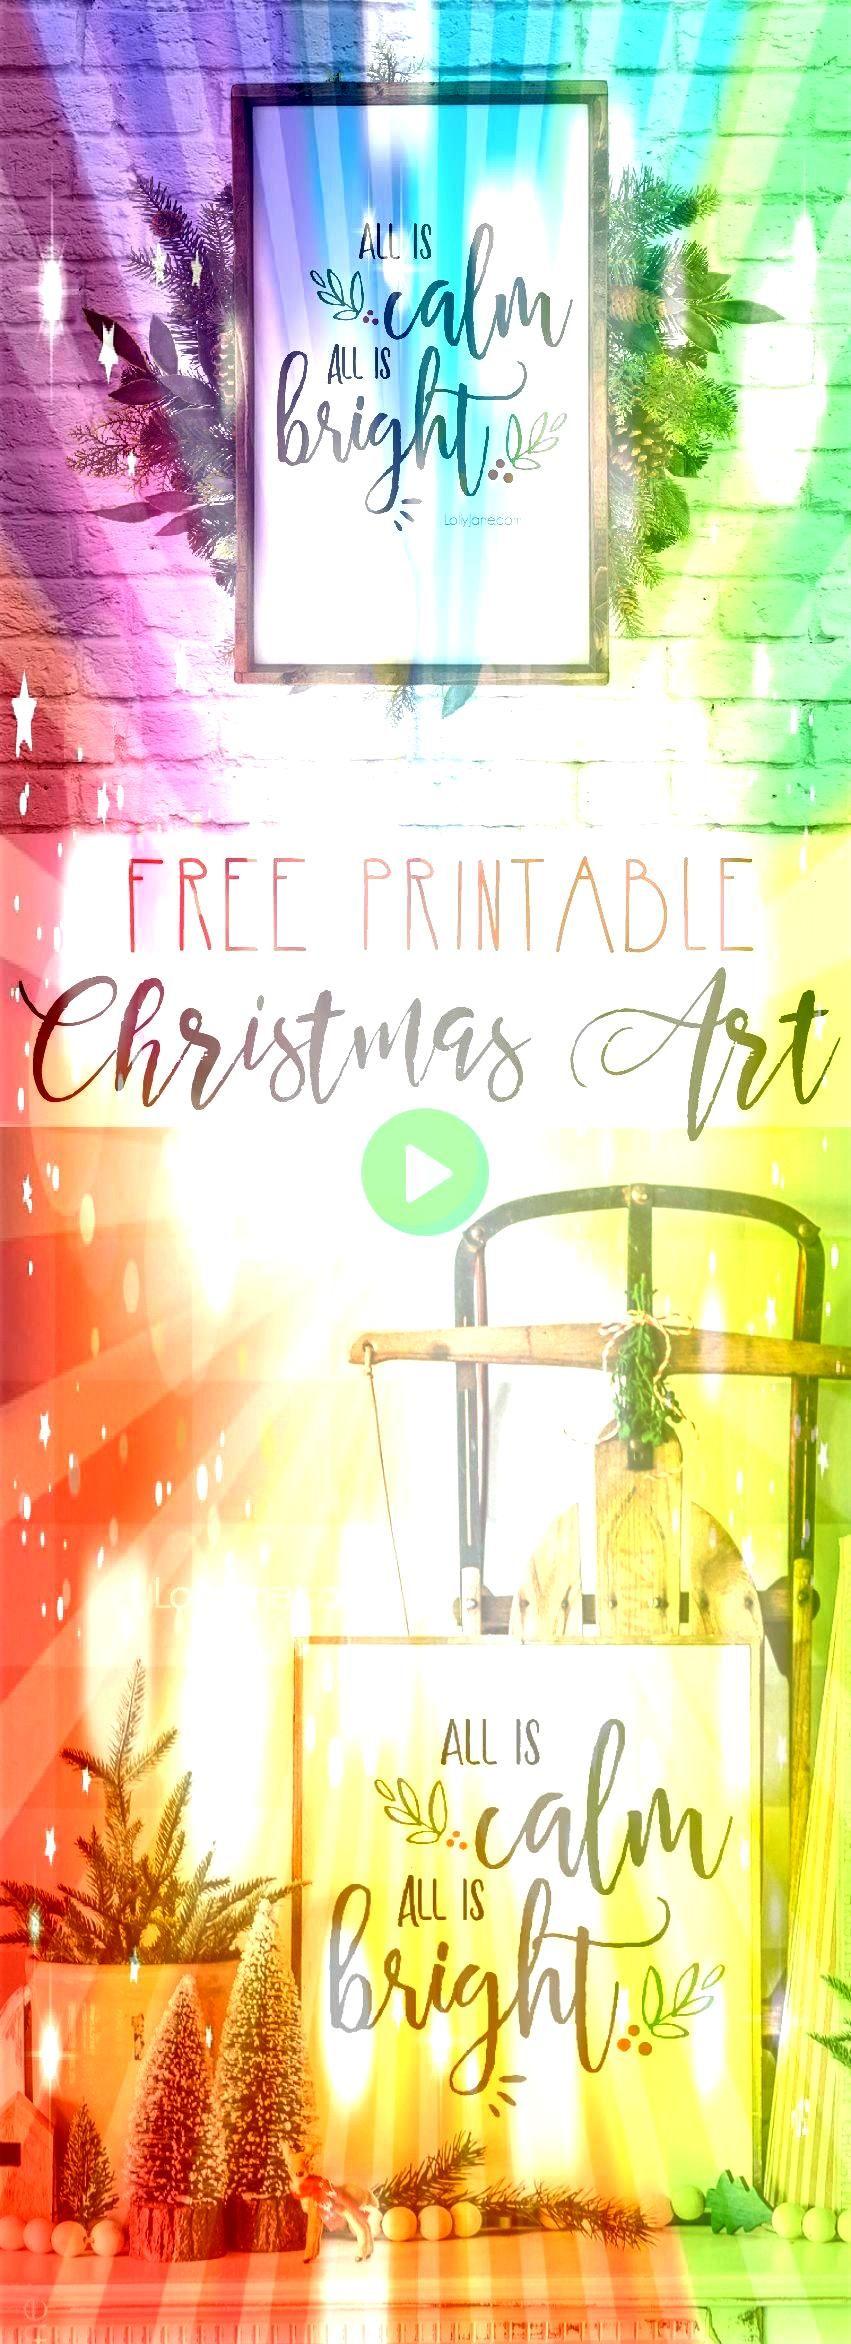 silent night christmas art  Love this pretty FREE Printable Christmas Art use as art a card invitation banner or to simpl free printable silent night christmas art  Love...